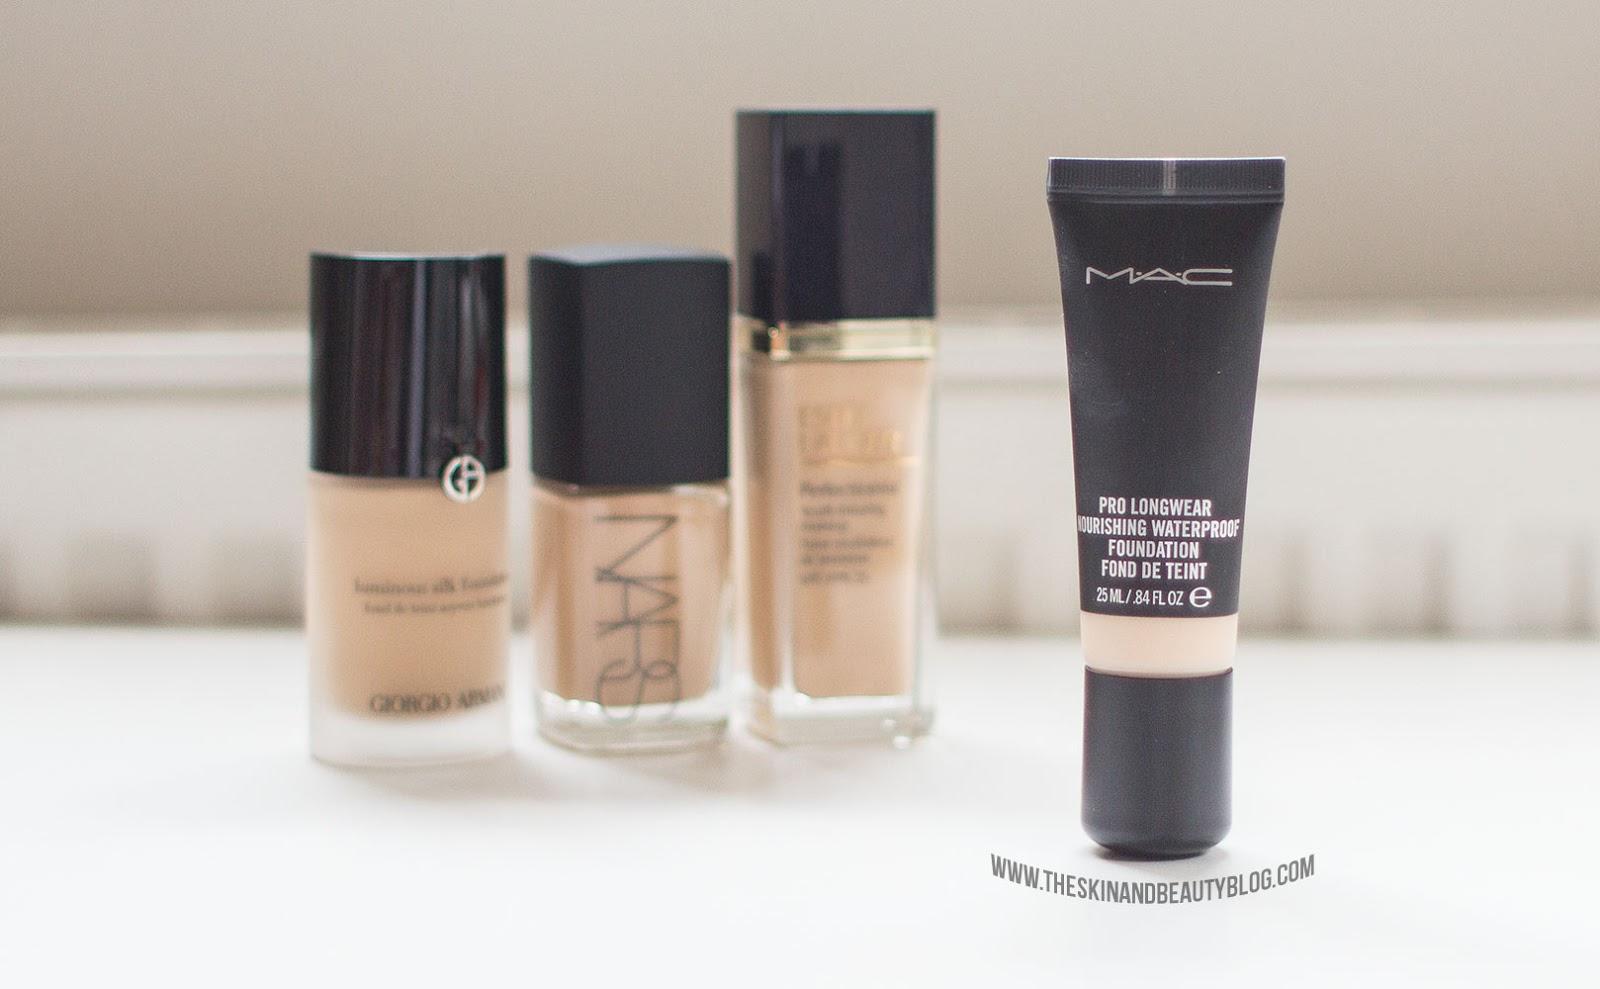 Mascara loreal paradise review